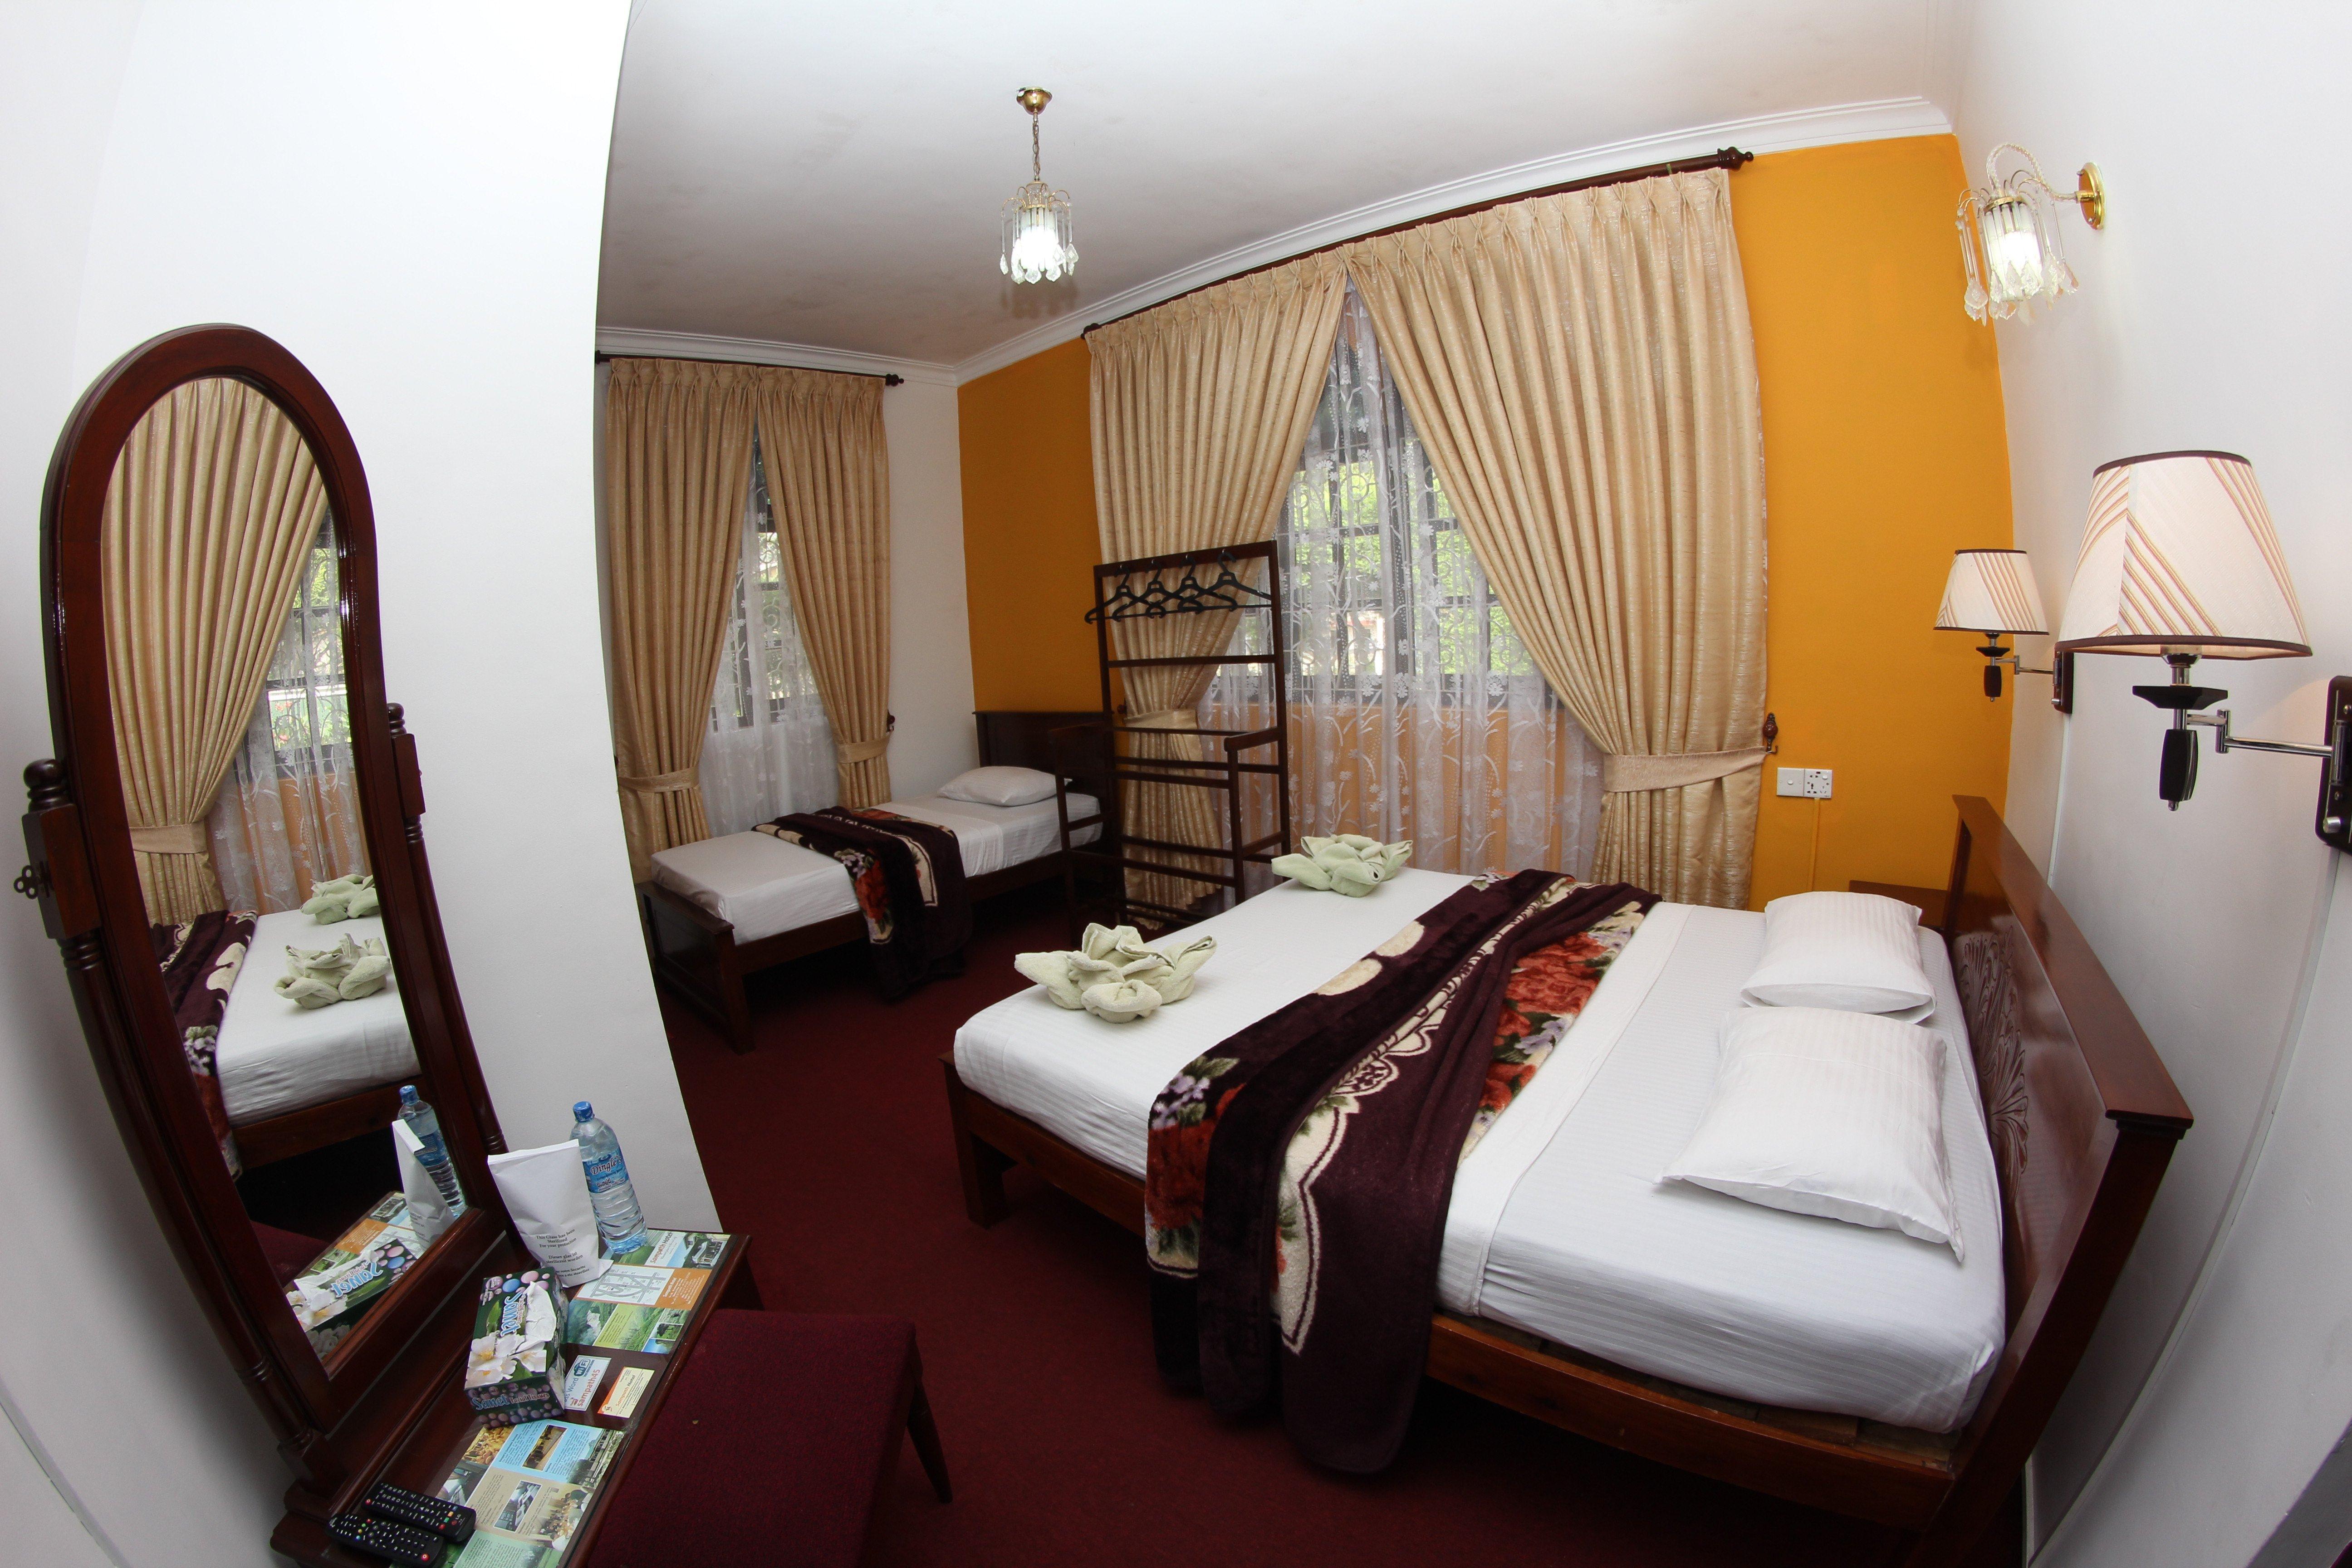 Sampath Hotel